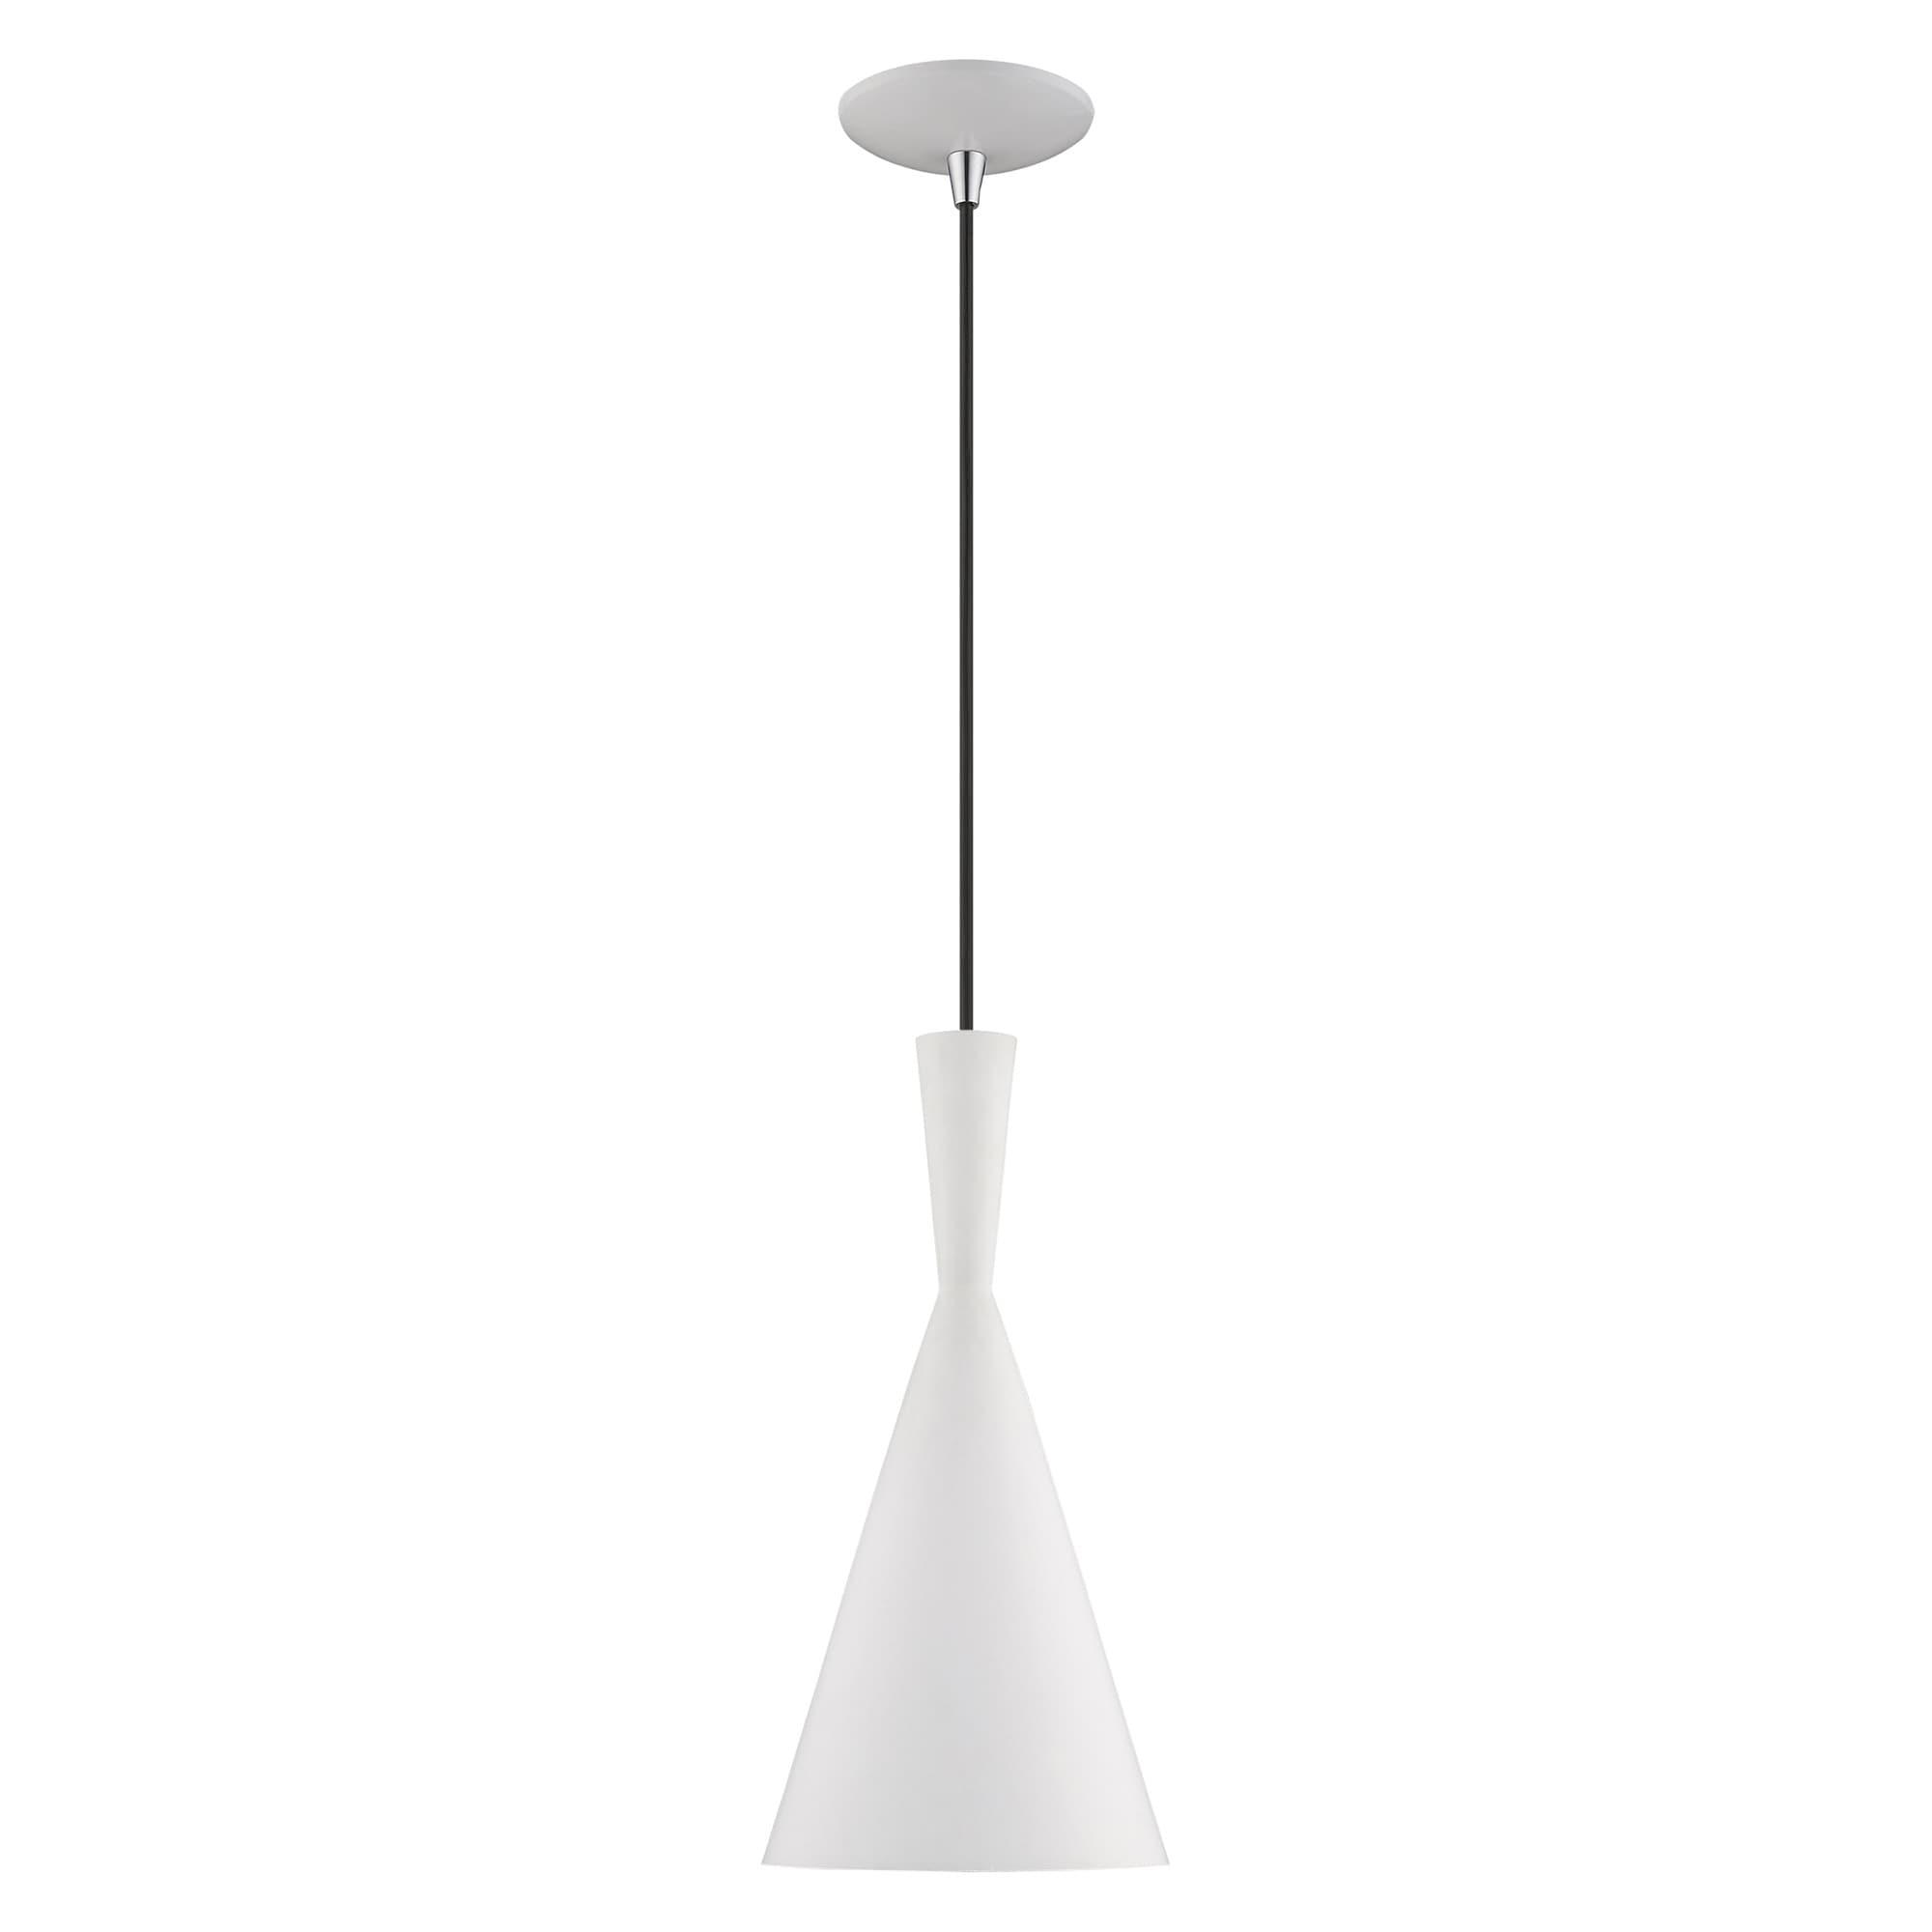 Livex Lighting Metal Double Cone Shade 1 Light Mini Pendant 7 25 Dia X 21 80 Adj H Overstock 25994139